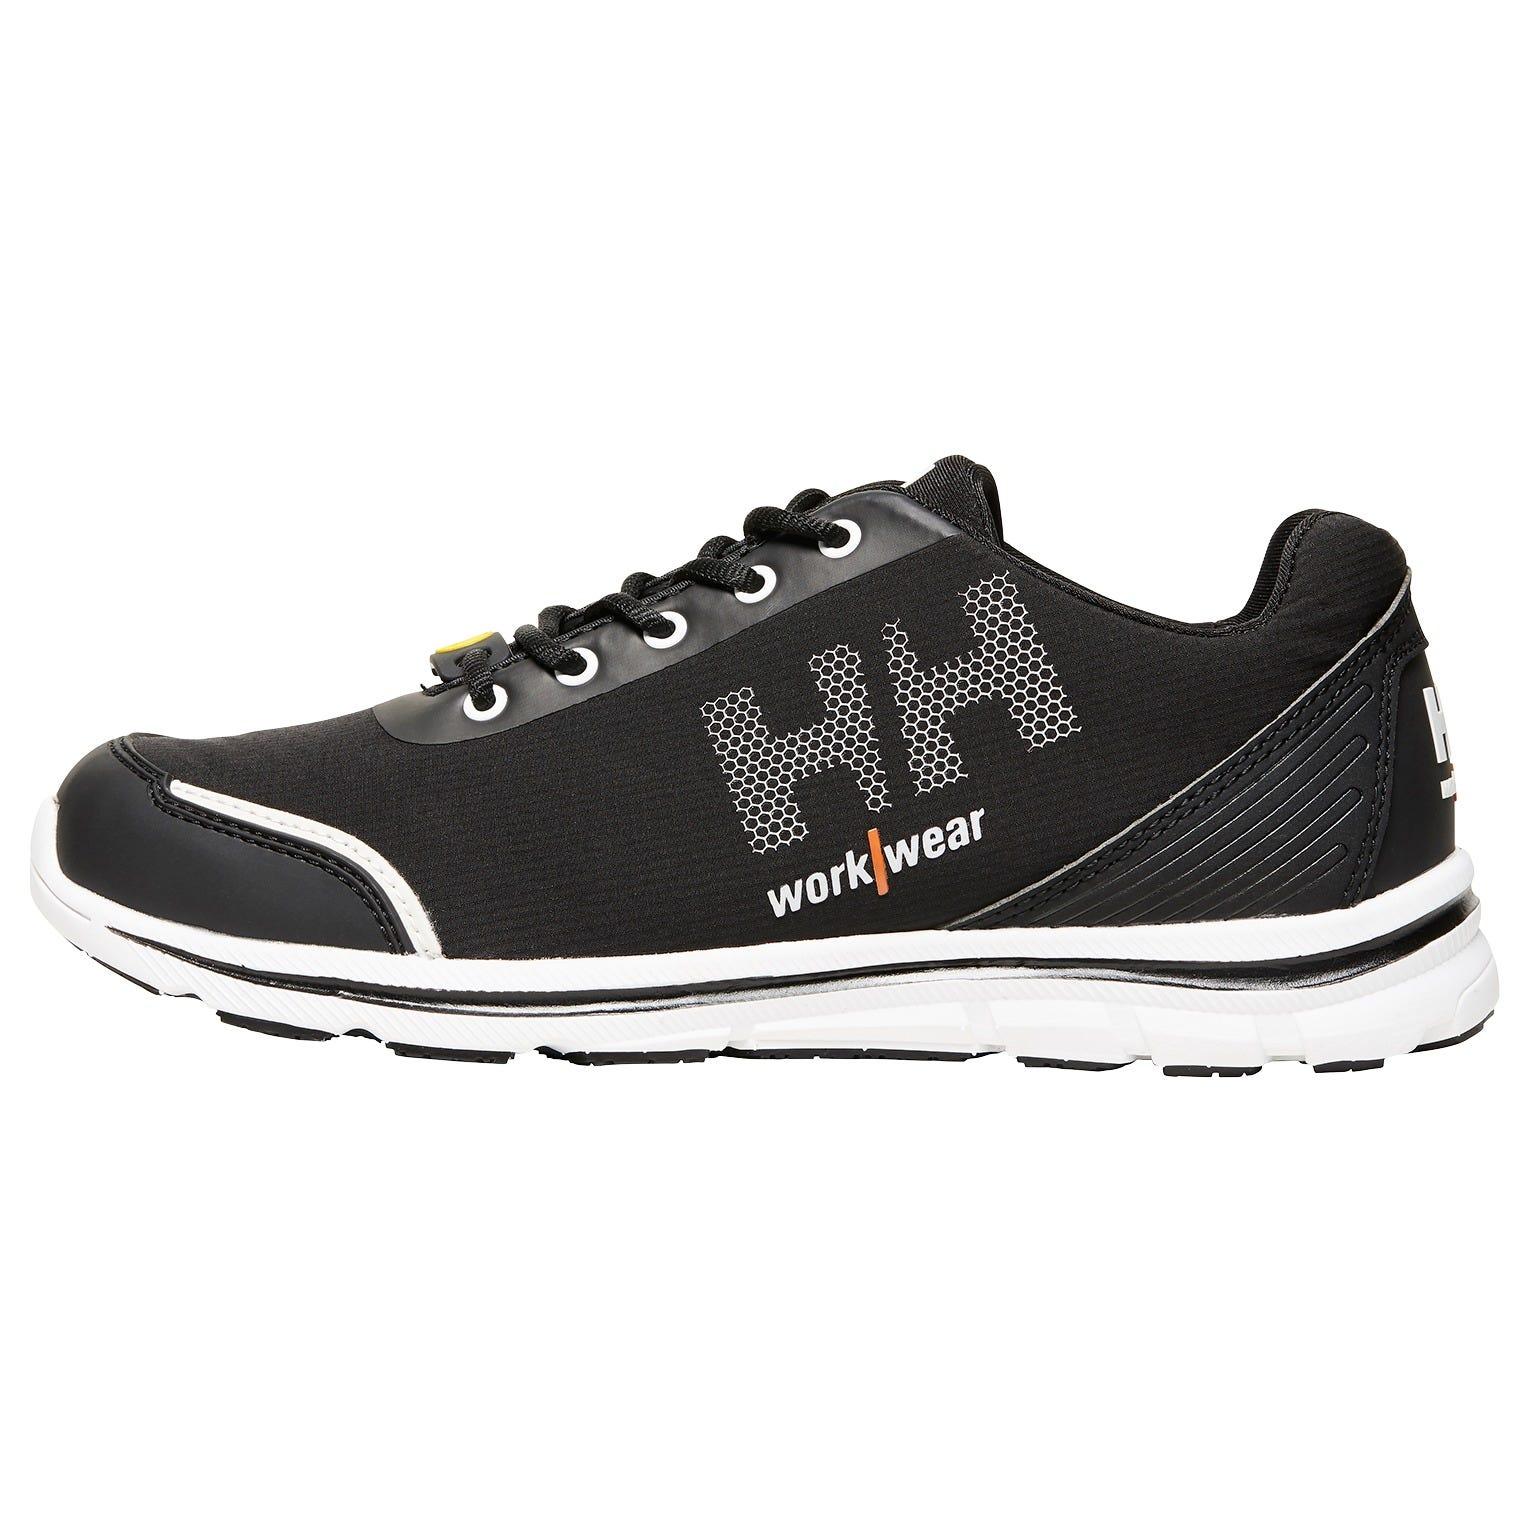 HH Workwear Workwear Oslo Slip Resistant Soft Toe O1 Safety Shoes Black 37